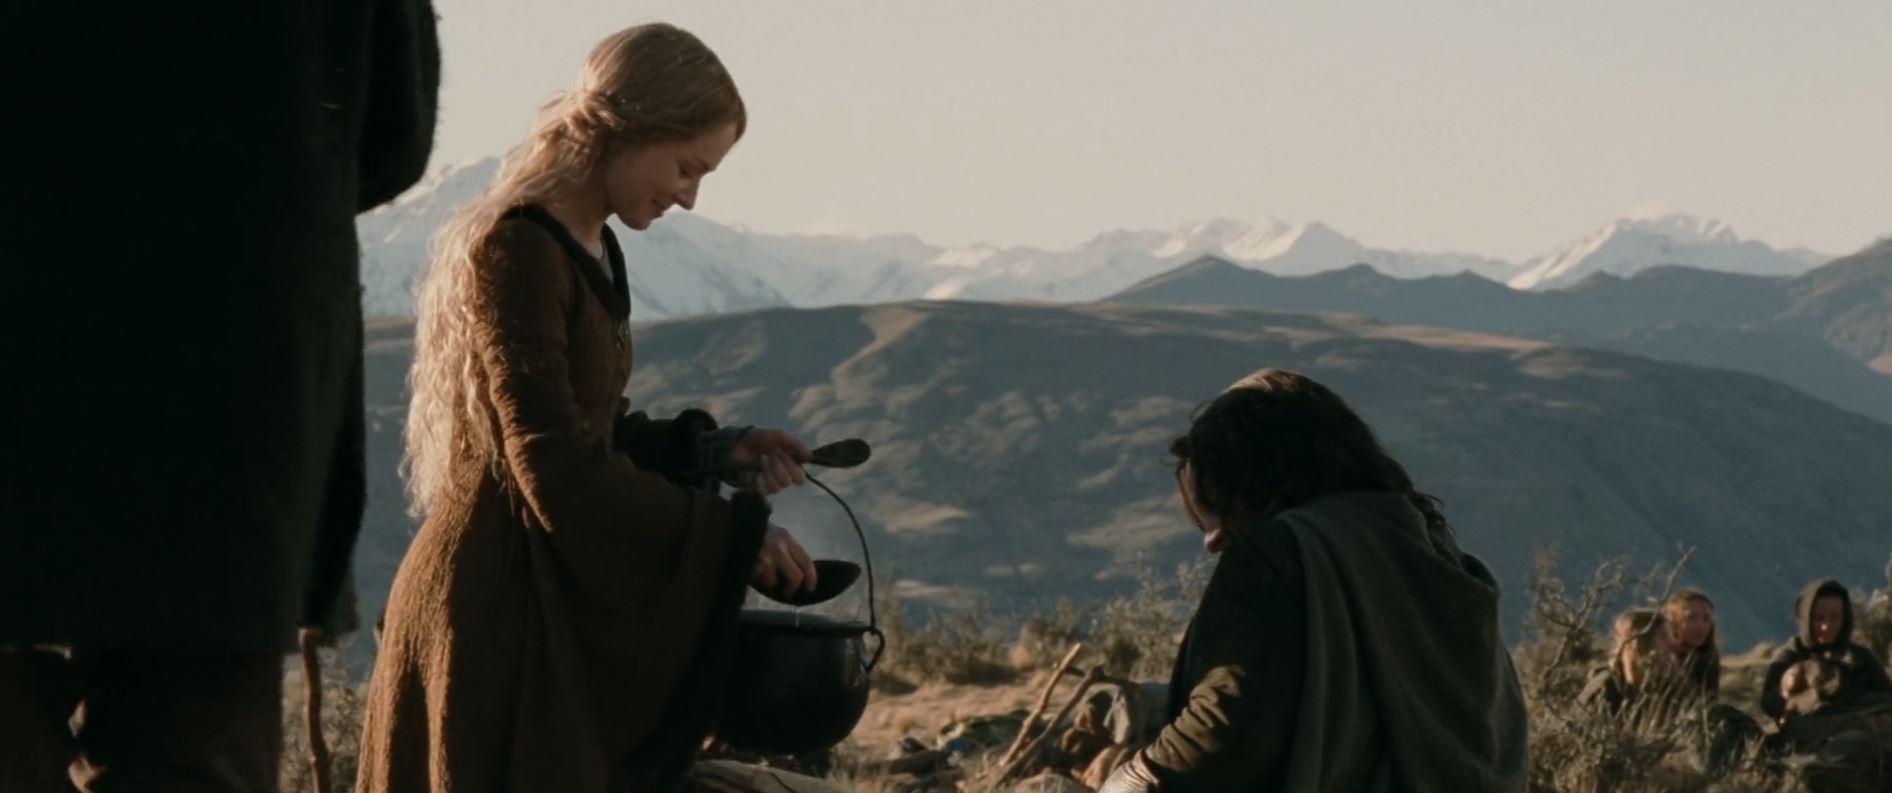 le seigneur des anneaux eowyn repas ragout aragorn